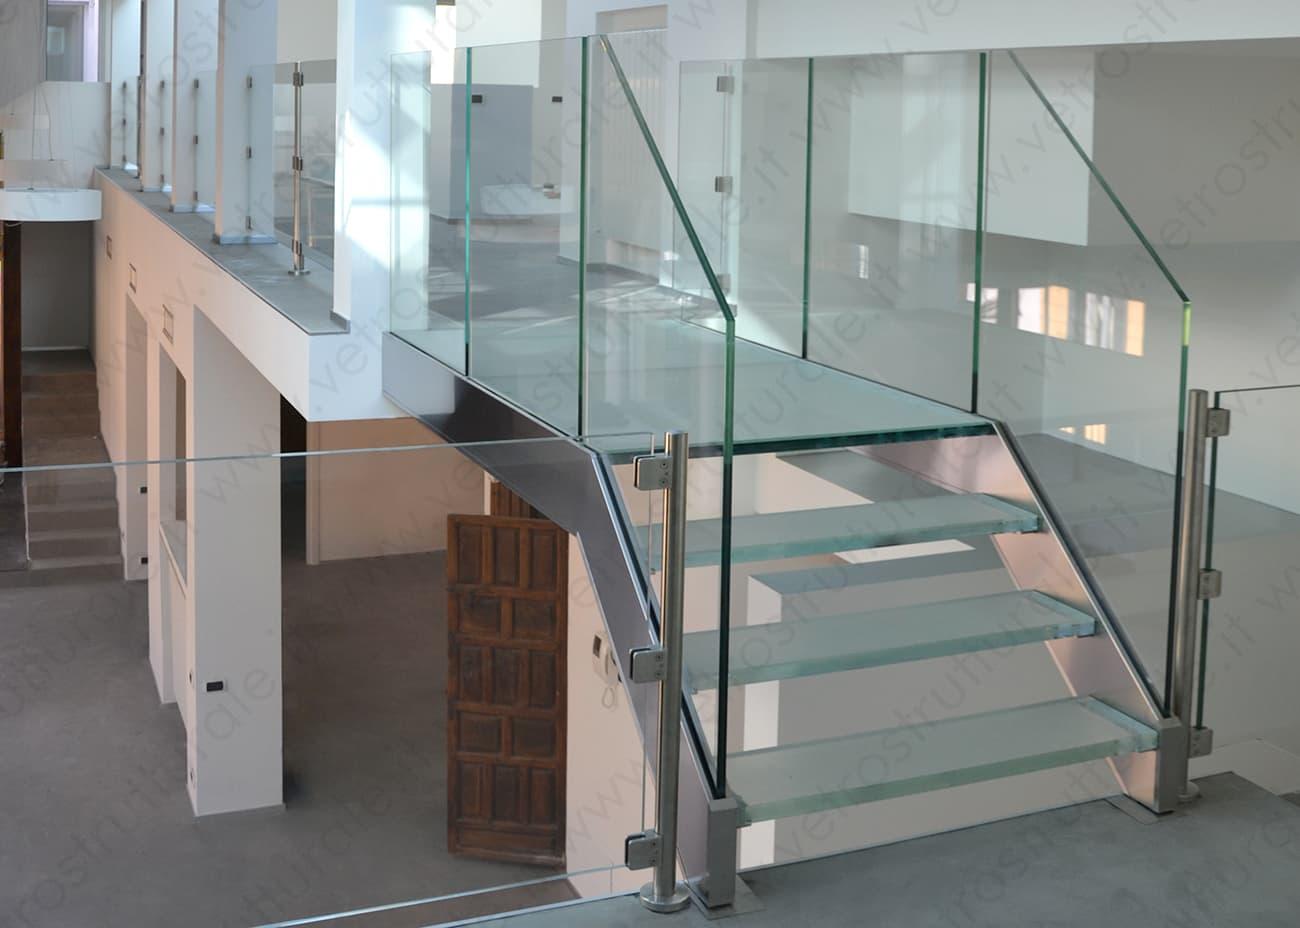 scala in vetro strutturale Luisa Via Roma Firenze – interessanti effetti di luce.